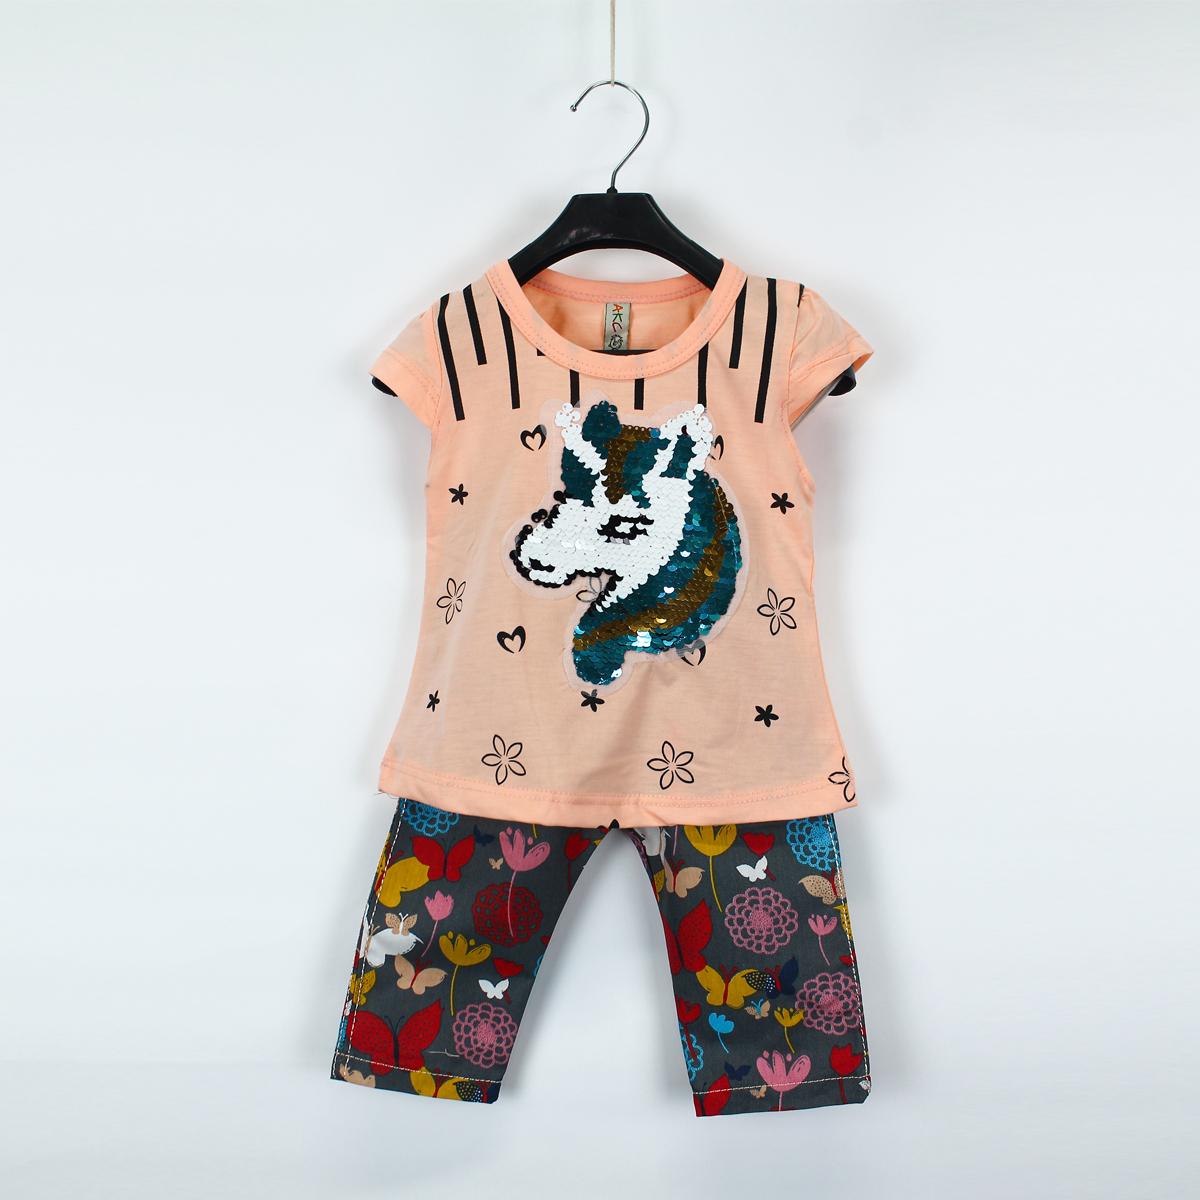 Cut Price Newborn Baby Suit 3 Mth - 9 Mth Sequins Unicorn